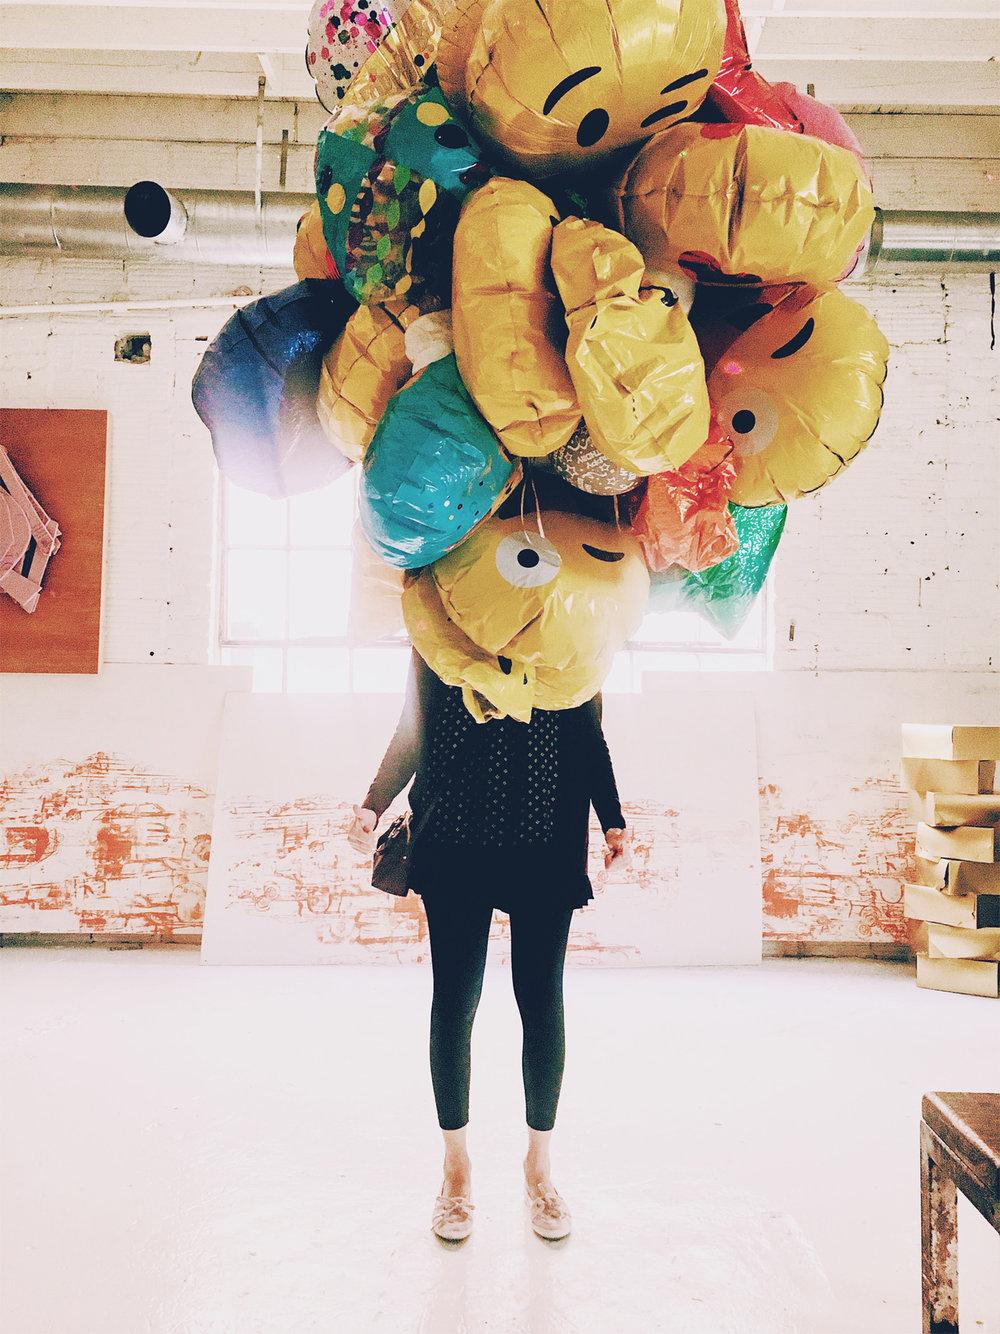 balloon-face.jpg